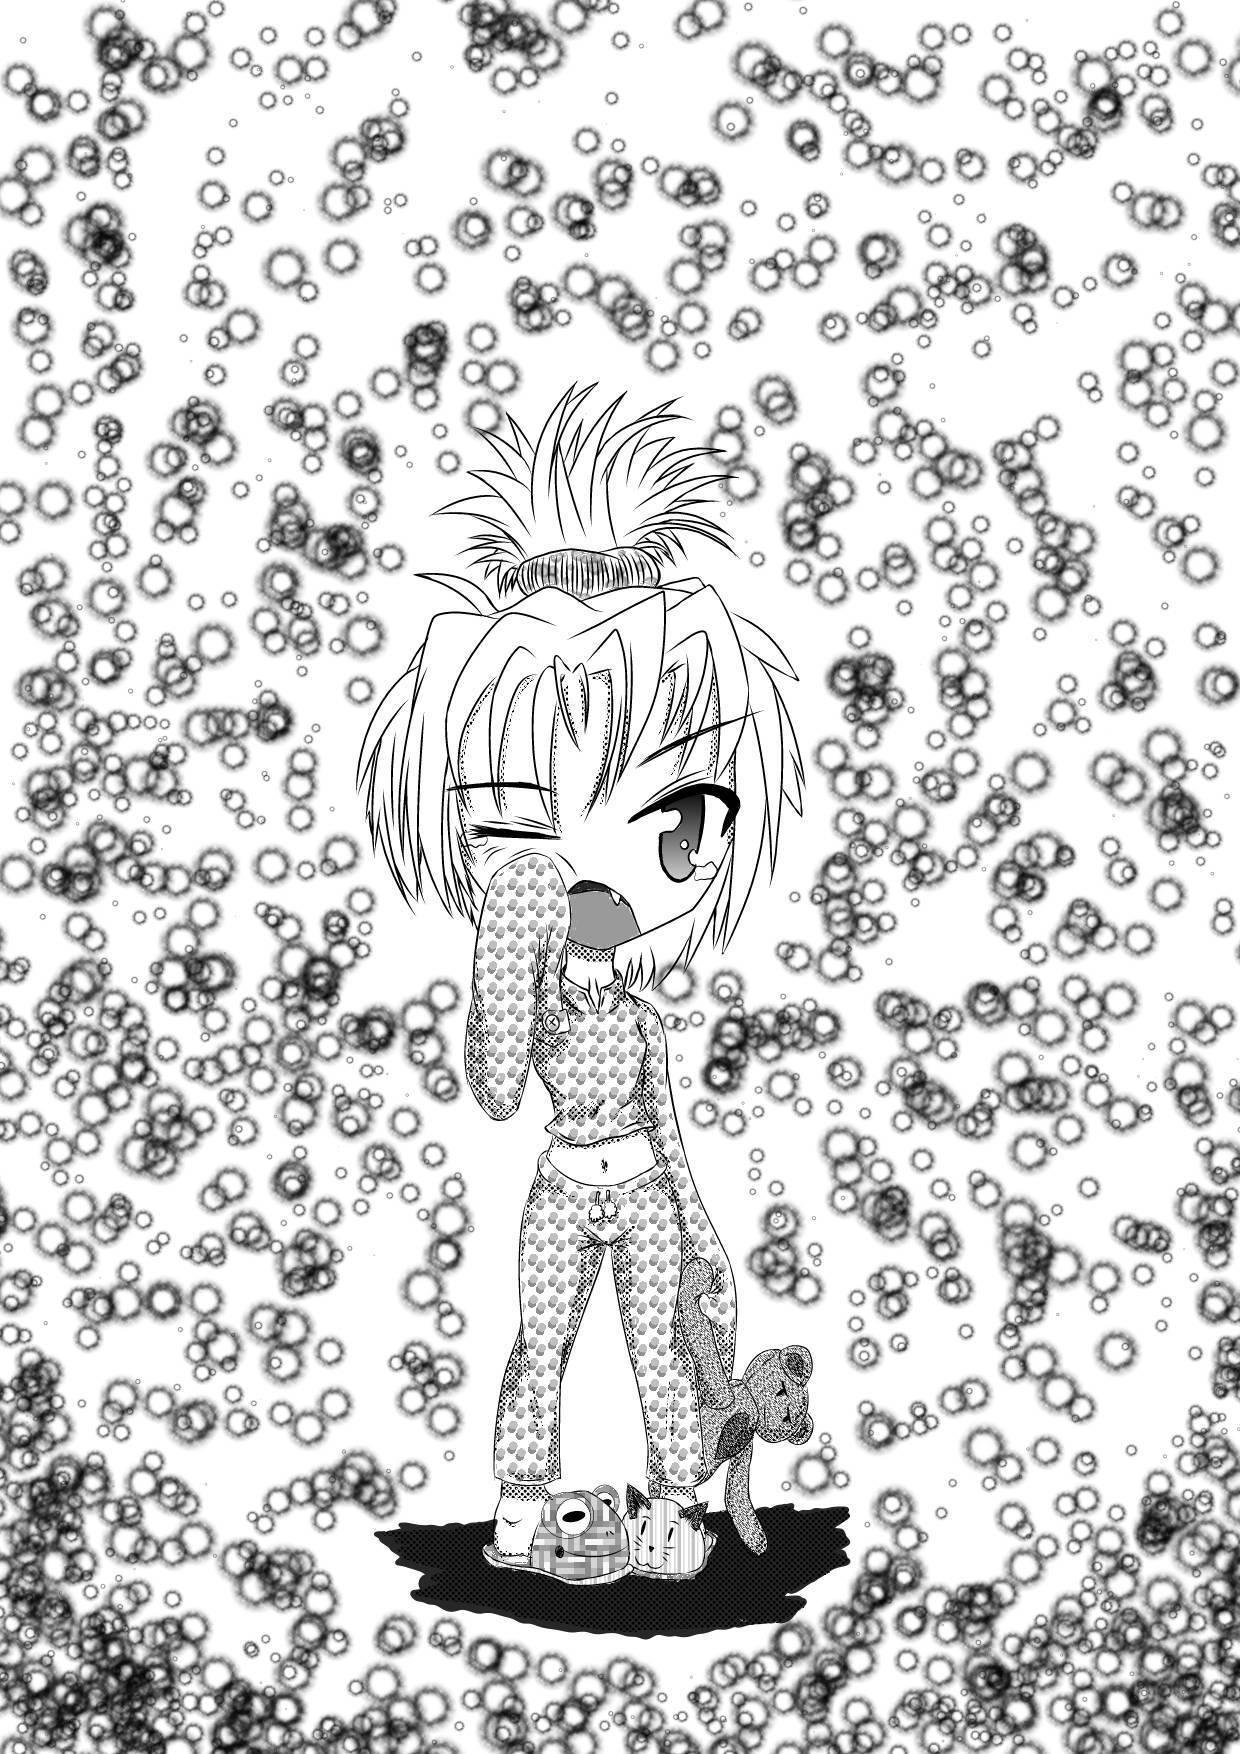 Dibujos hechos a mano, estilo Manga